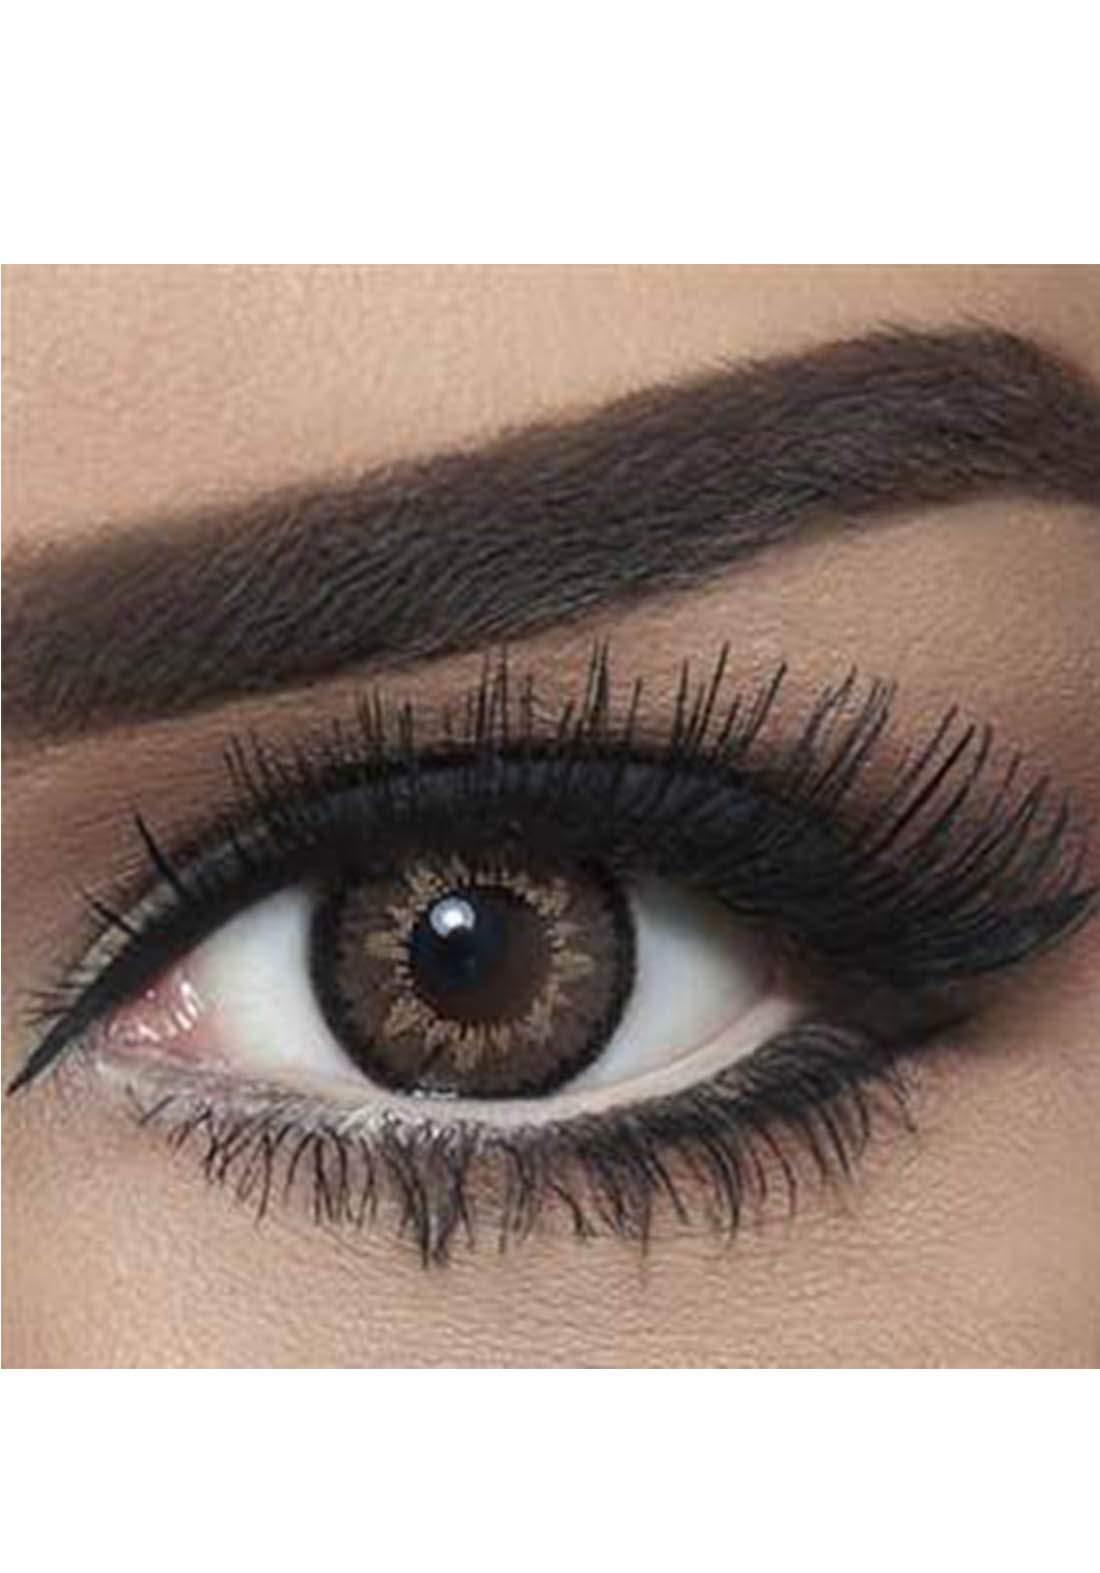 Bella Classic 301013 Contact Lenses 3 Months Use High Light - Circle Brown No.14 عدسات لاصقة